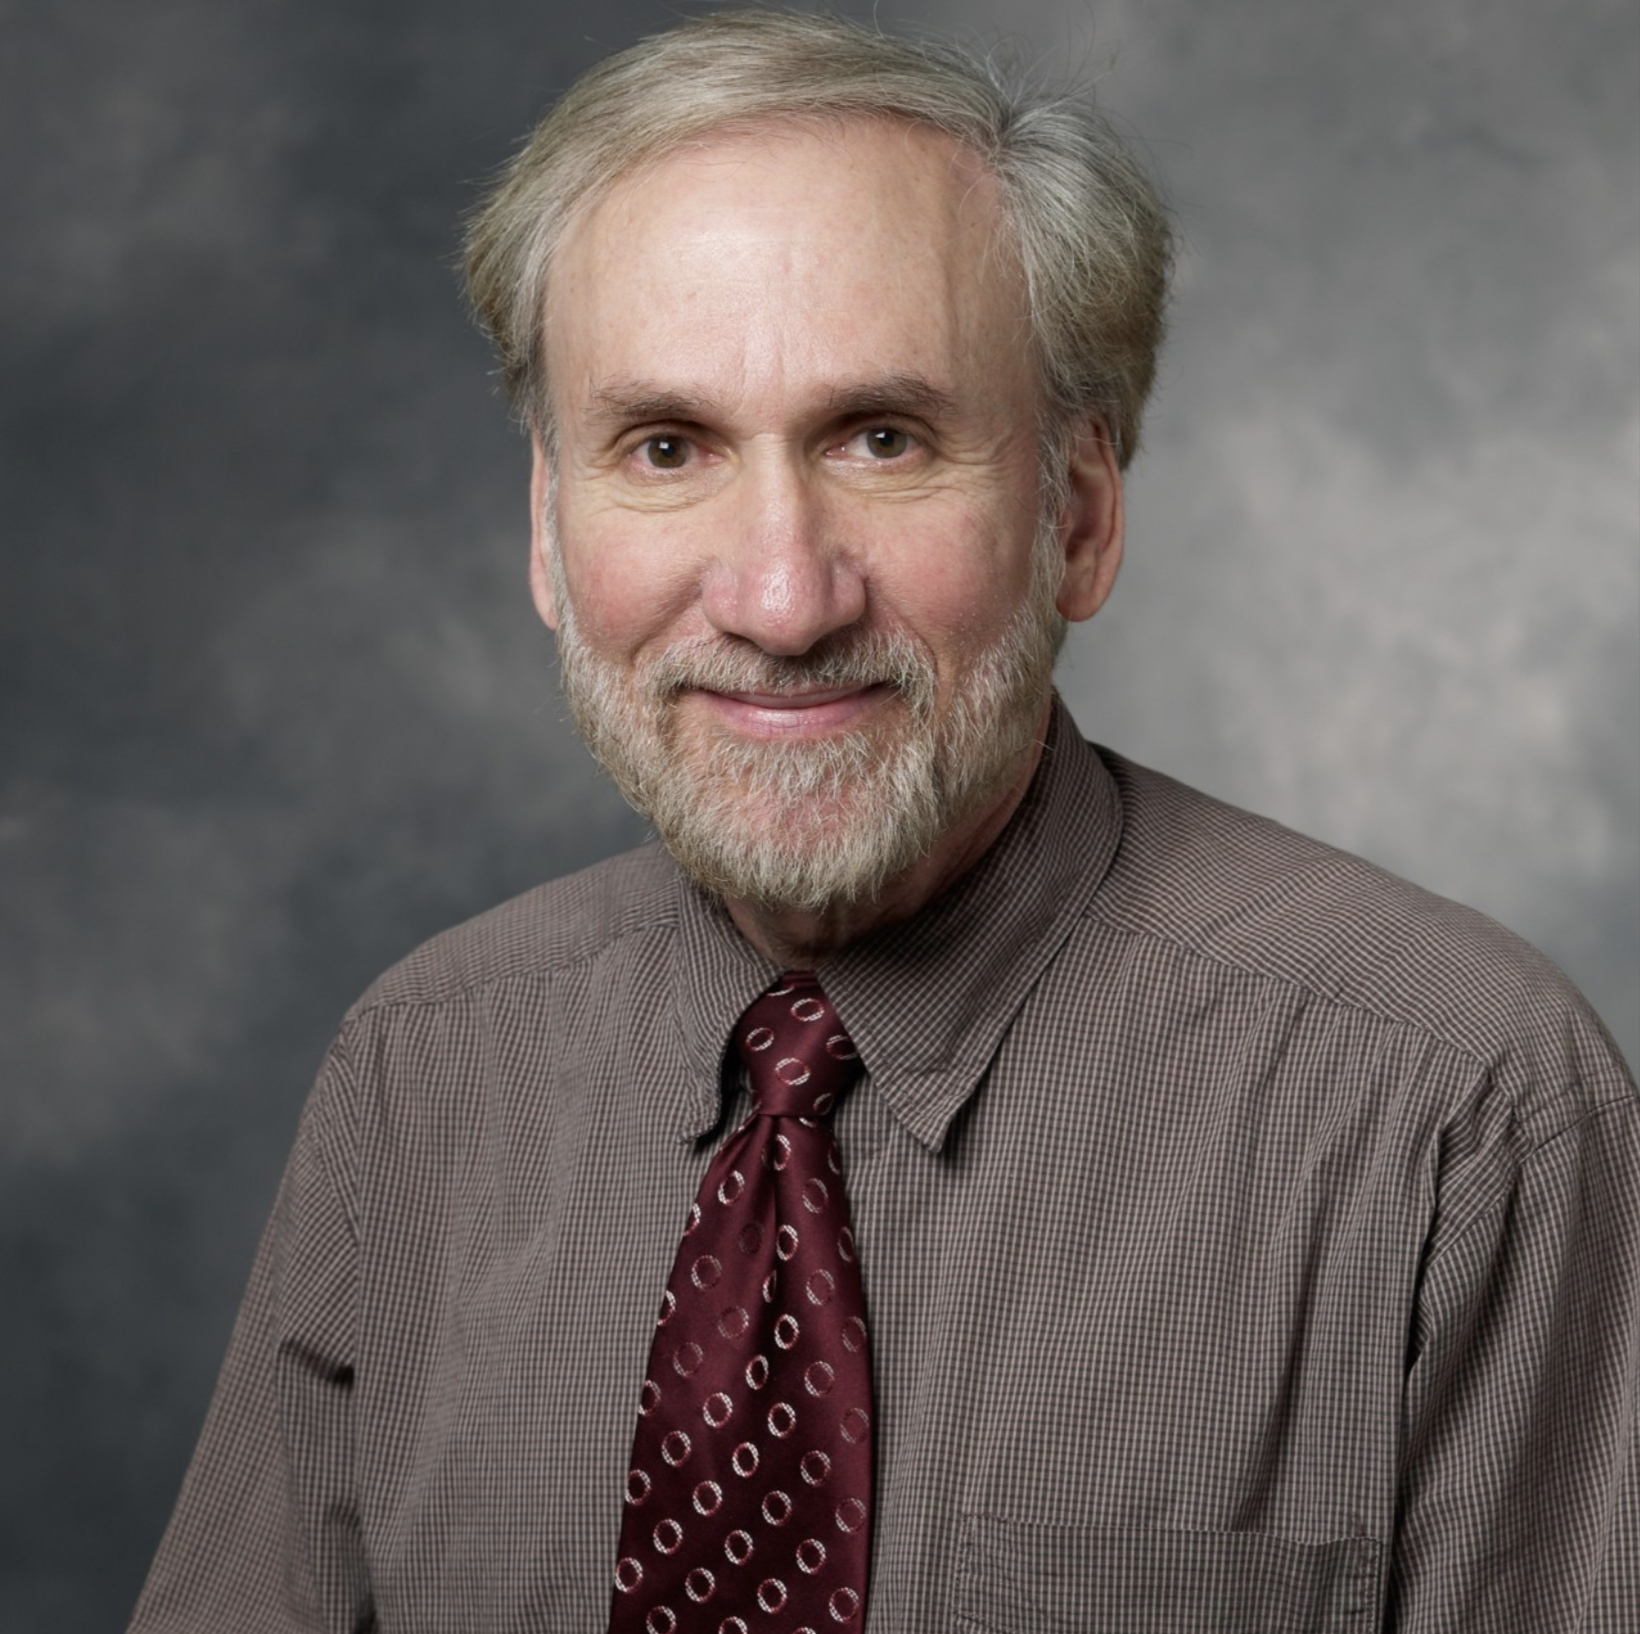 Dr. Neil Gesundheit, Professor of Medicine and Senior Associate Dean, Stanford University